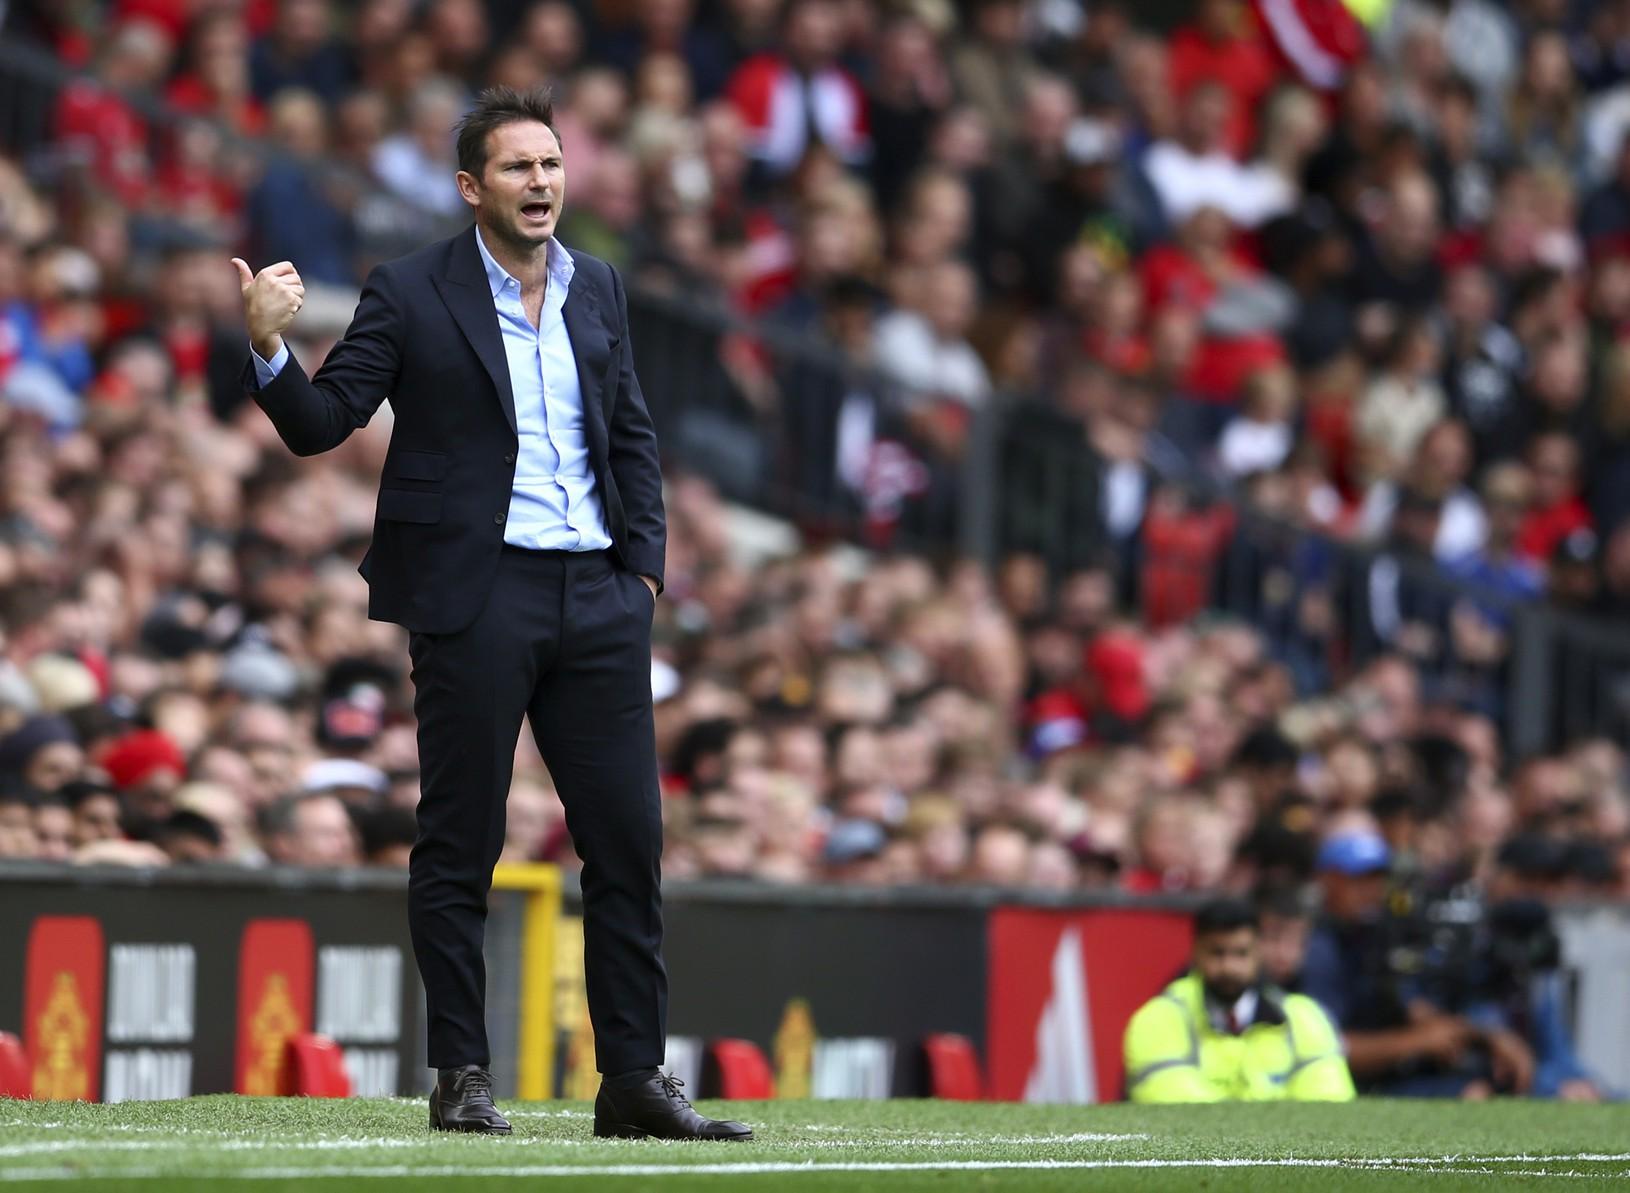 Tréner Chelsea Frank Lampard